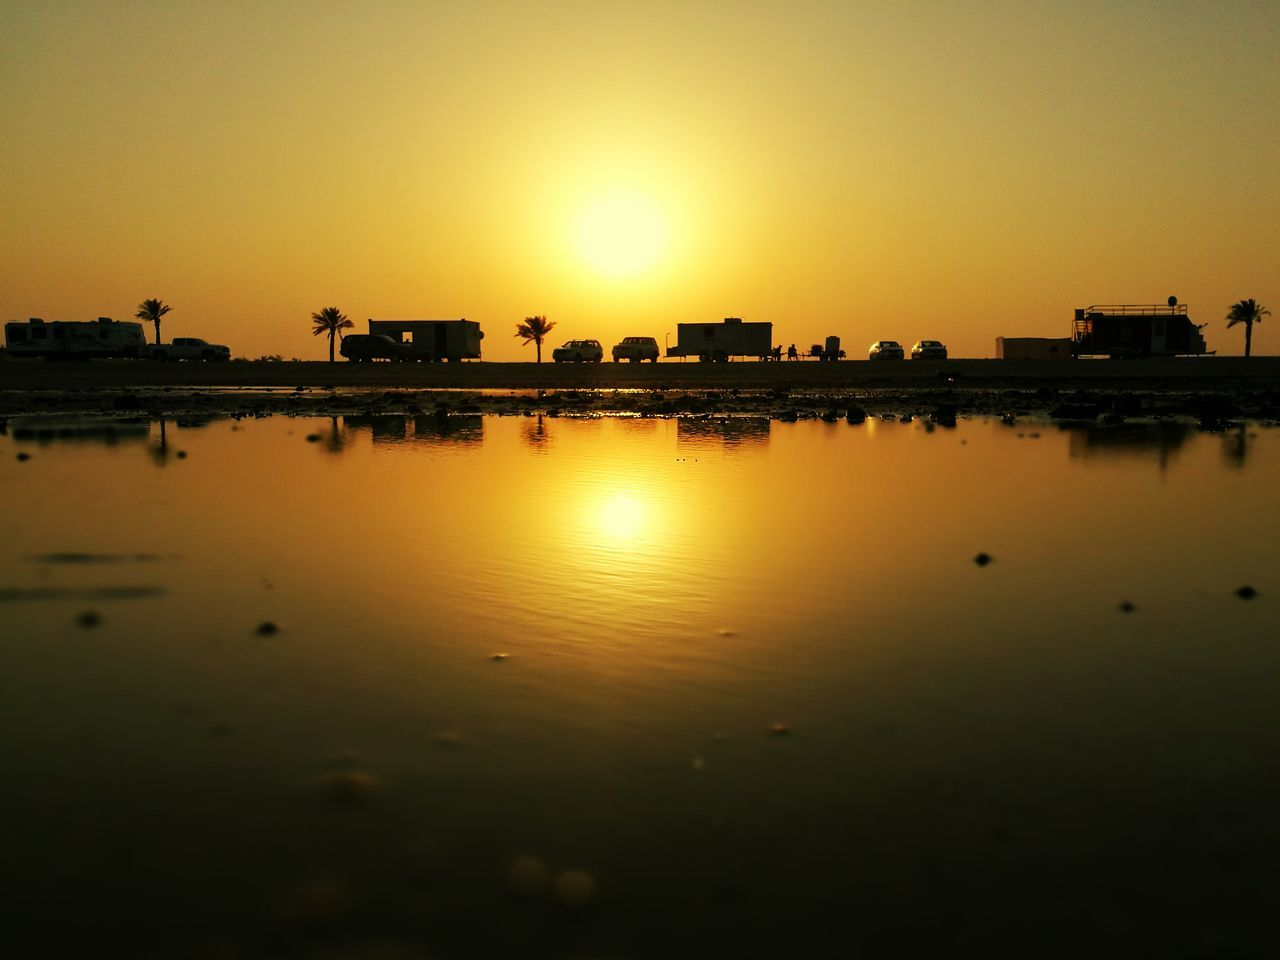 Sunset Water Reflection Sun Beauty In Nature Sea Nature Calm Qatar Alwakrah Beach Beachphotography Palm Trees Beautiful Nature First Eyeem Photo